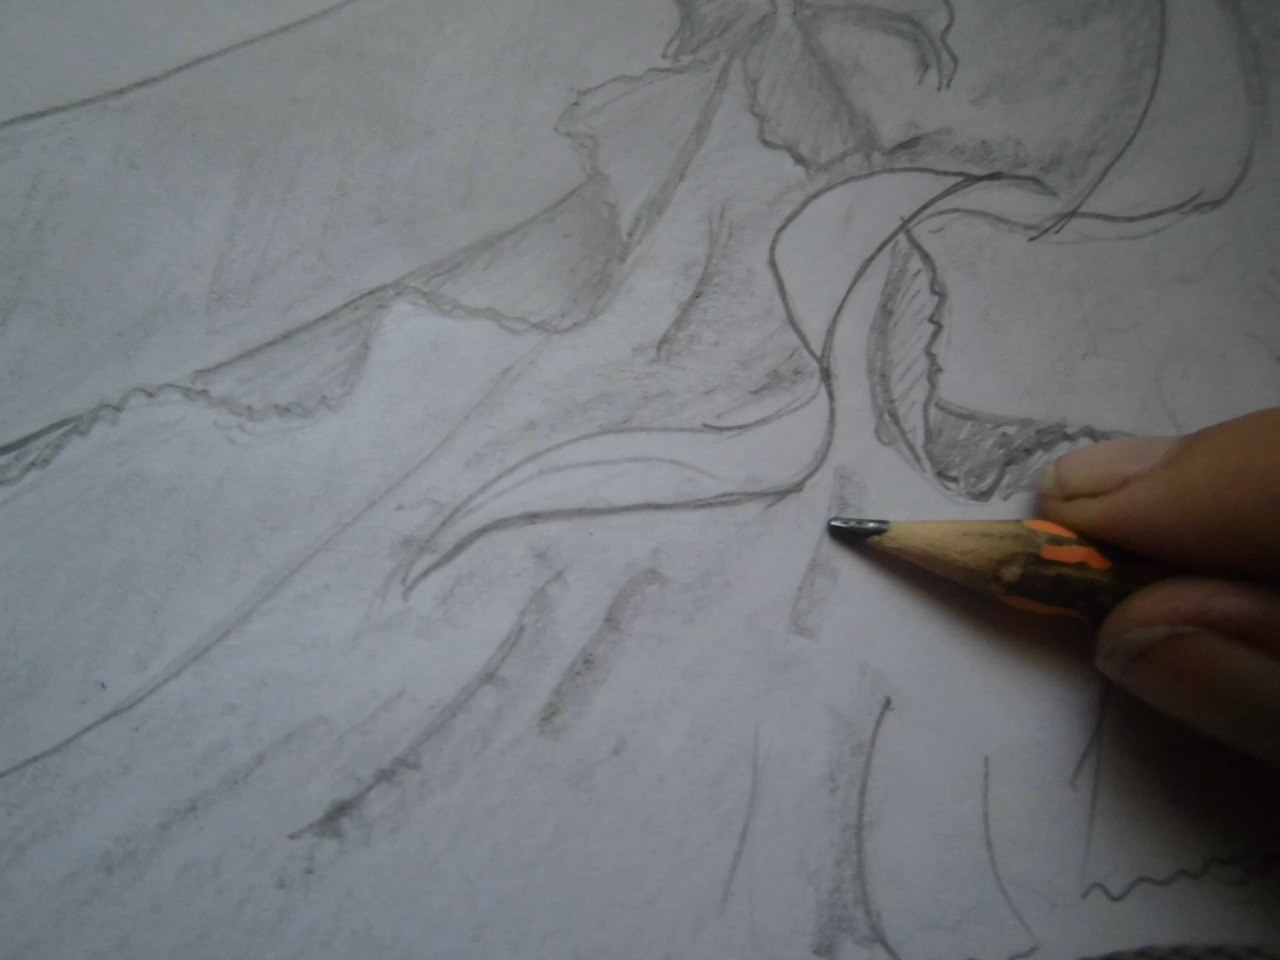 Рисуем танцующую аниме пару - фото 7